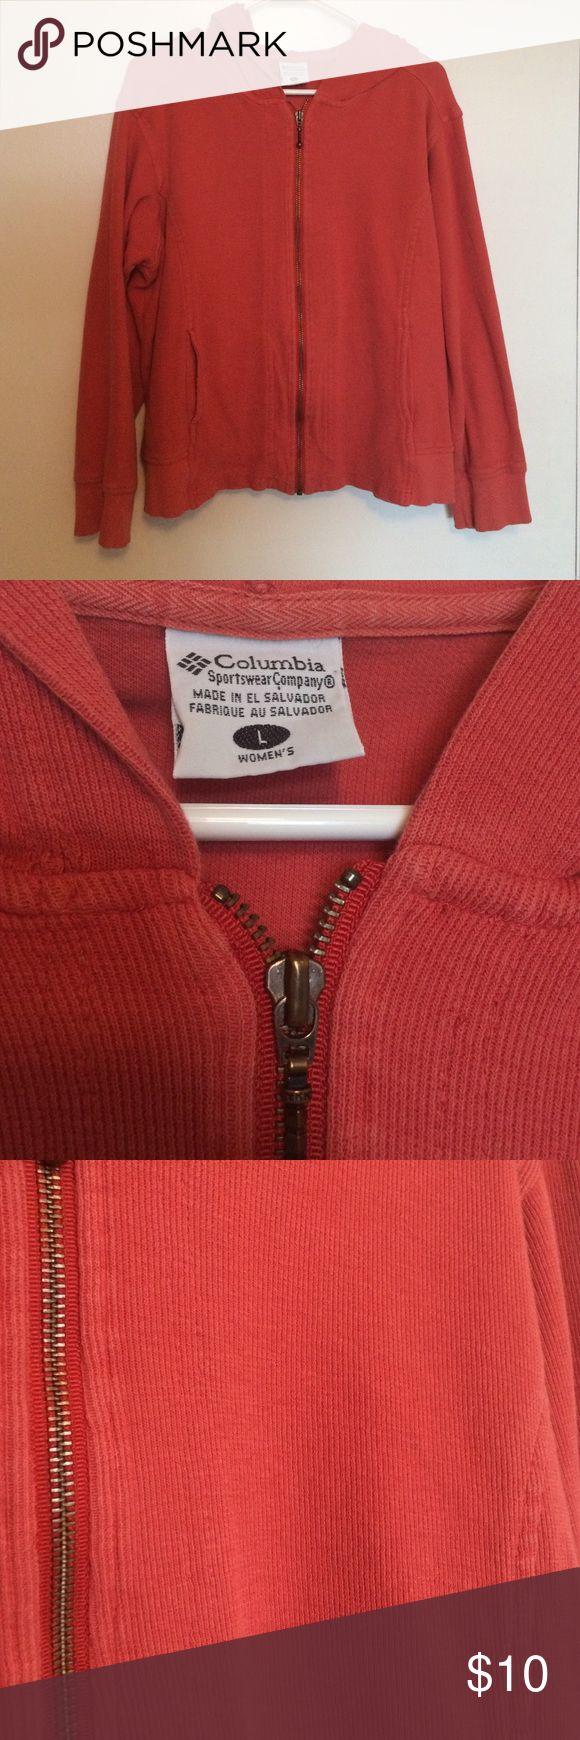 Columbia Jacket Coral jacket. Brand- Columbia. Size Large. Pet and smoke free home Columbia Jackets & Coats